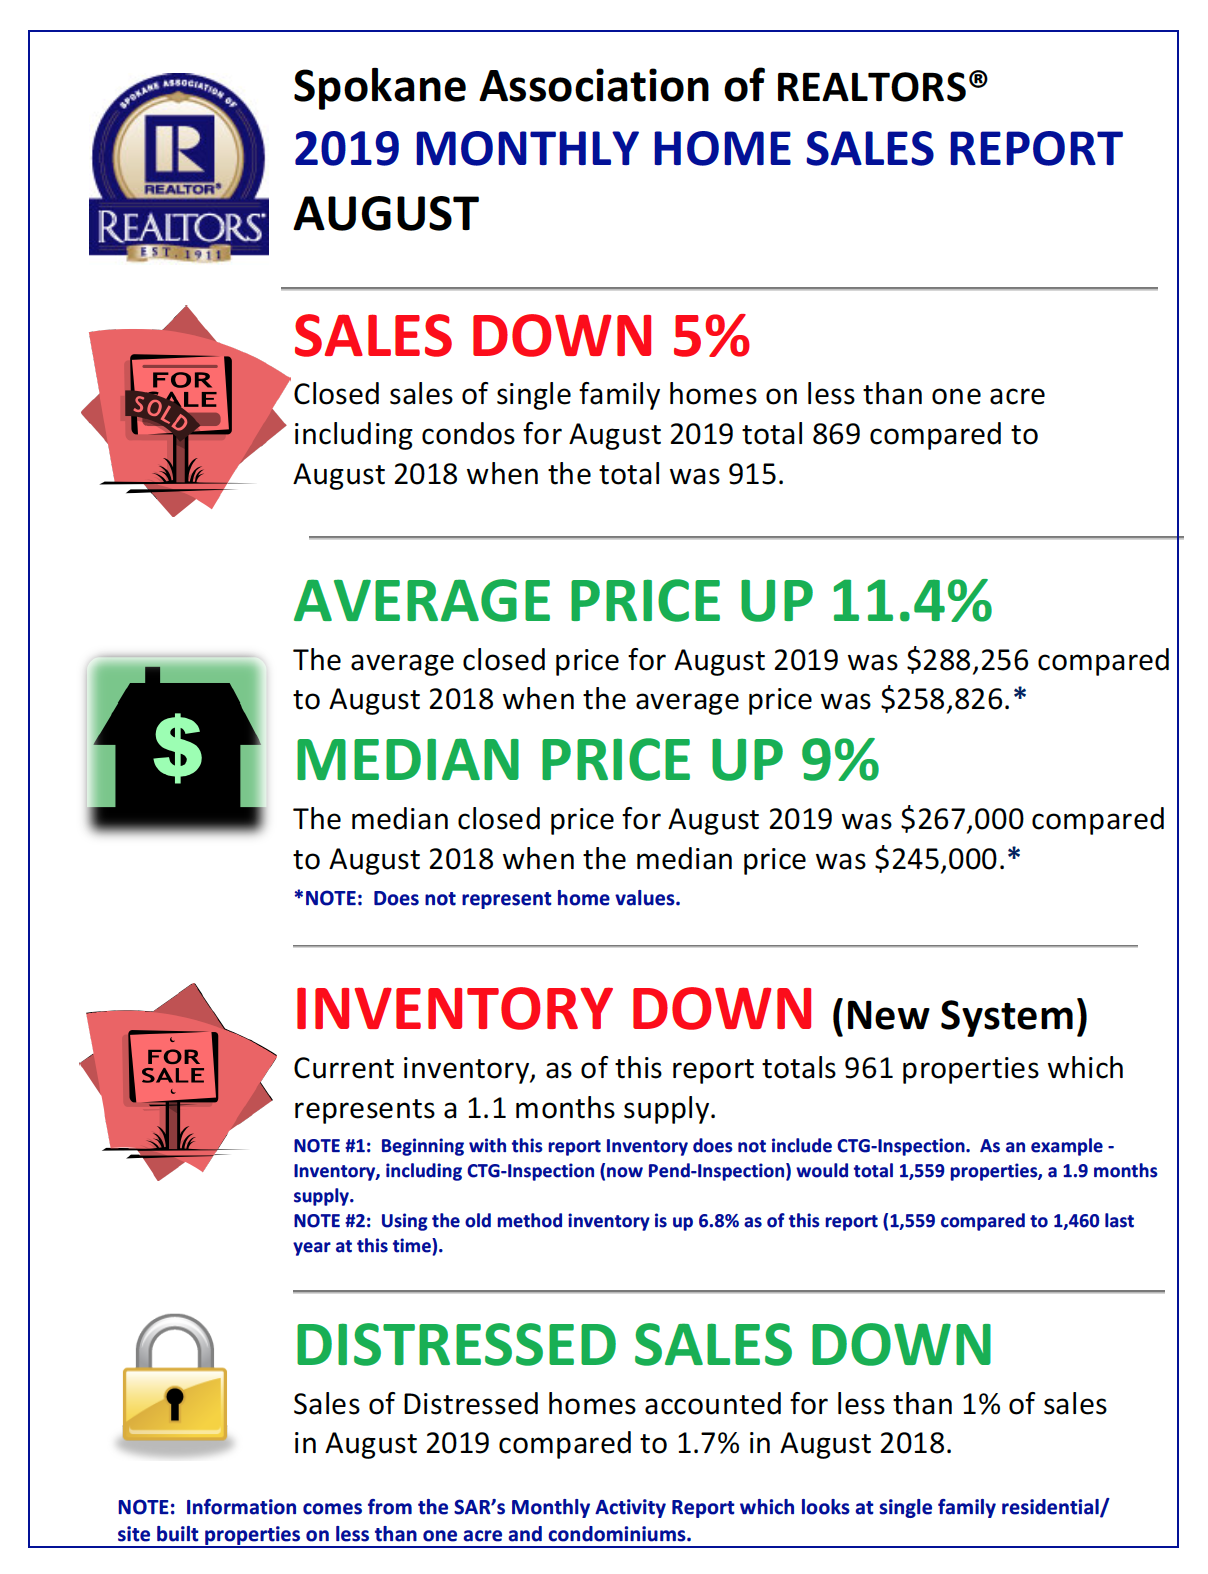 Market Snapshot | Spokane Association of REALTORS